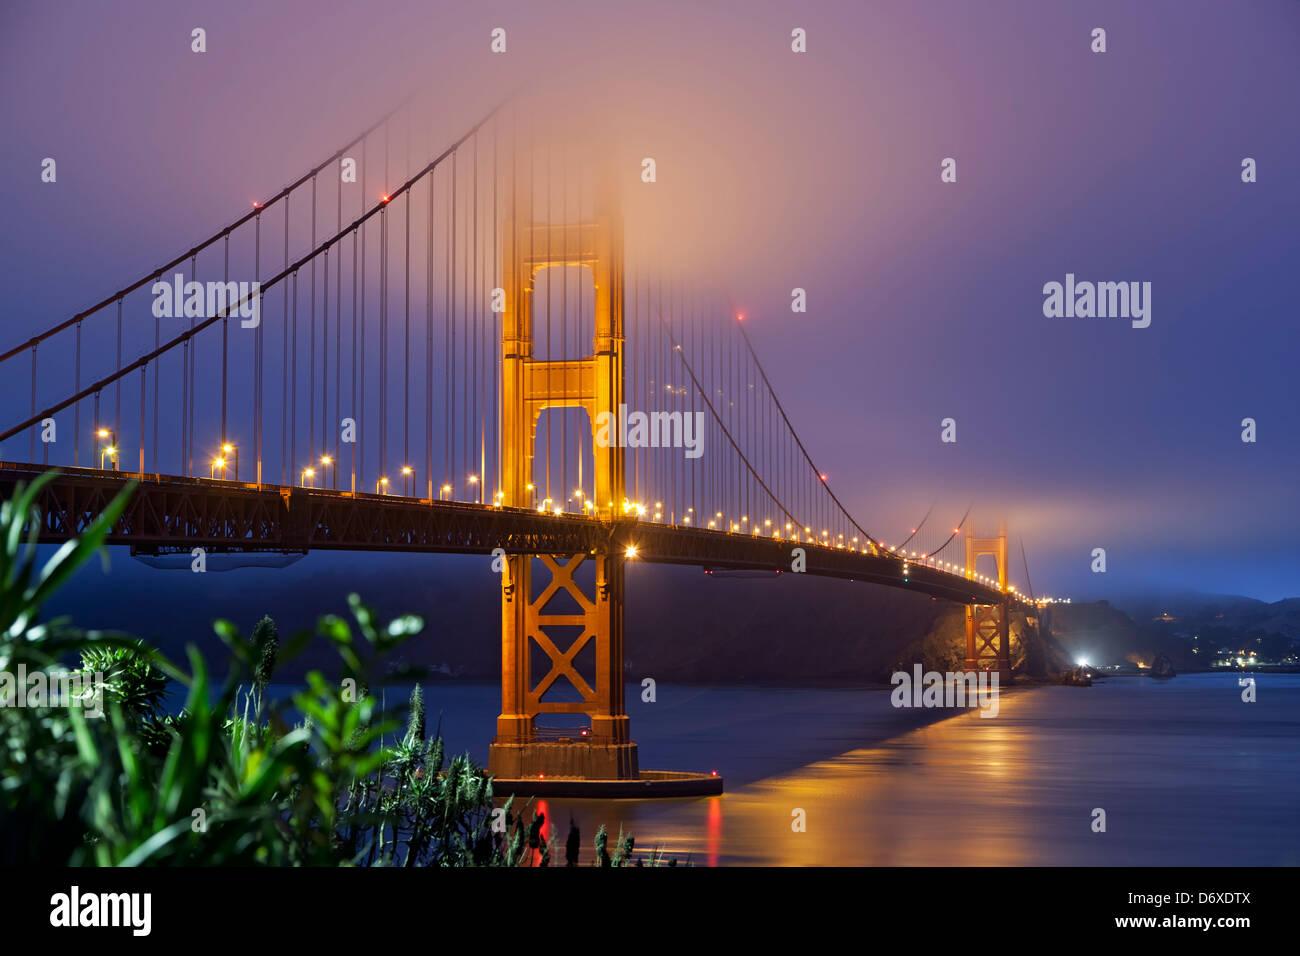 Le Golden Gate Bridge sous le brouillard, San Francisco, California USA Photo Stock